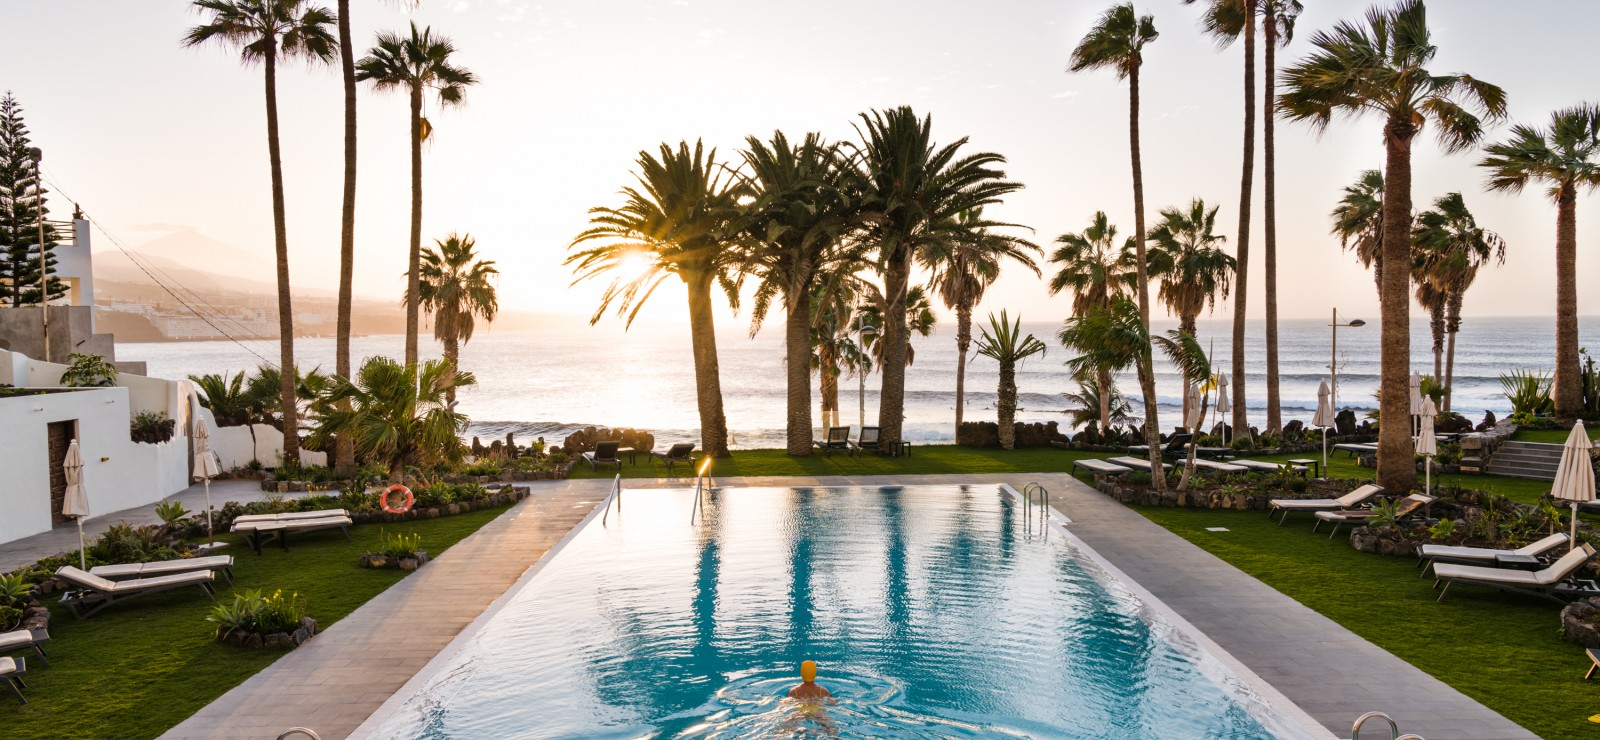 OCÉANO Hotel Health Spa - Tenerife Bilder | Bild 1